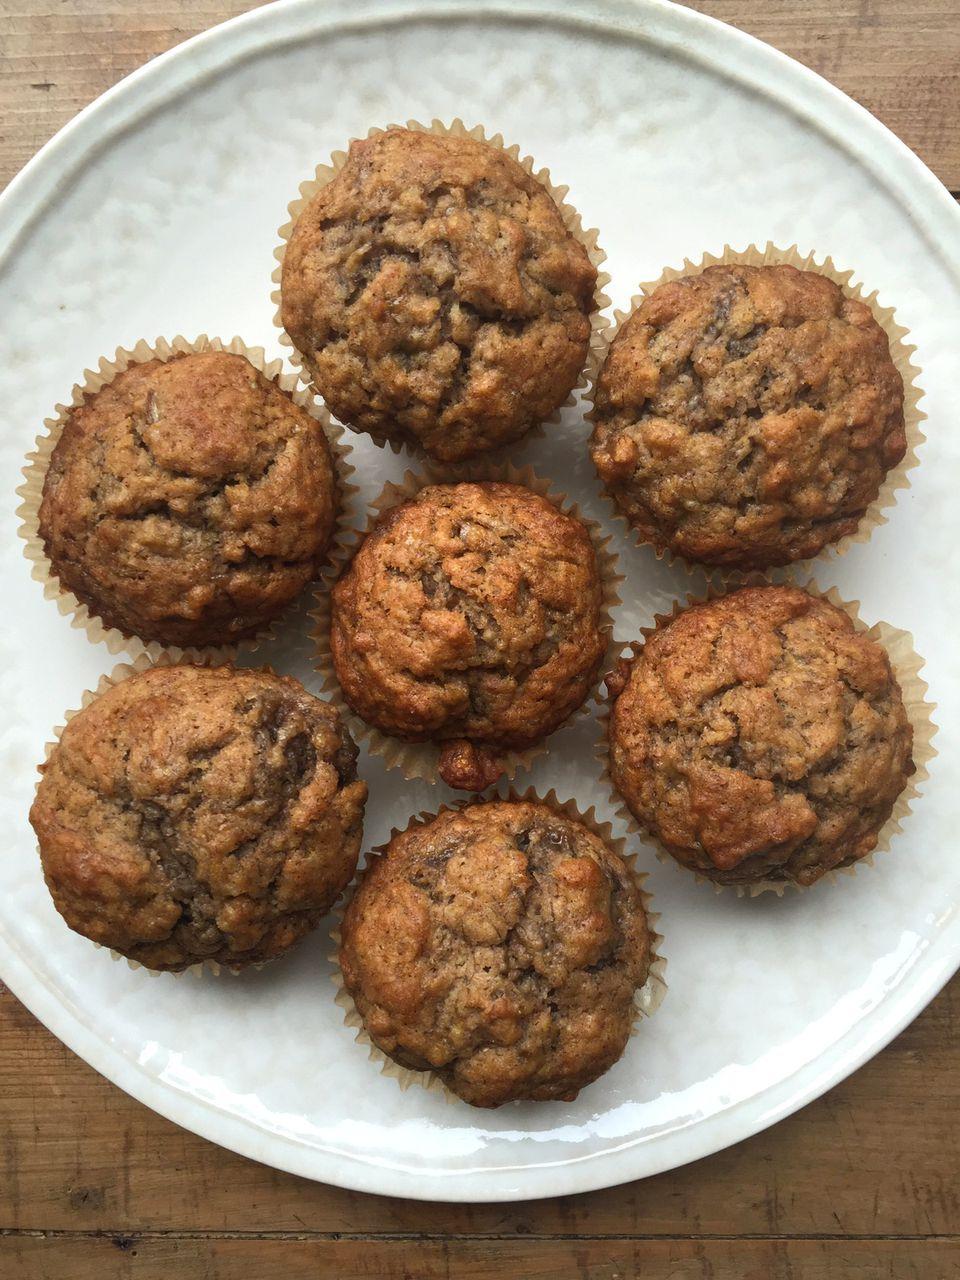 Coconut Oil Banana Muffins